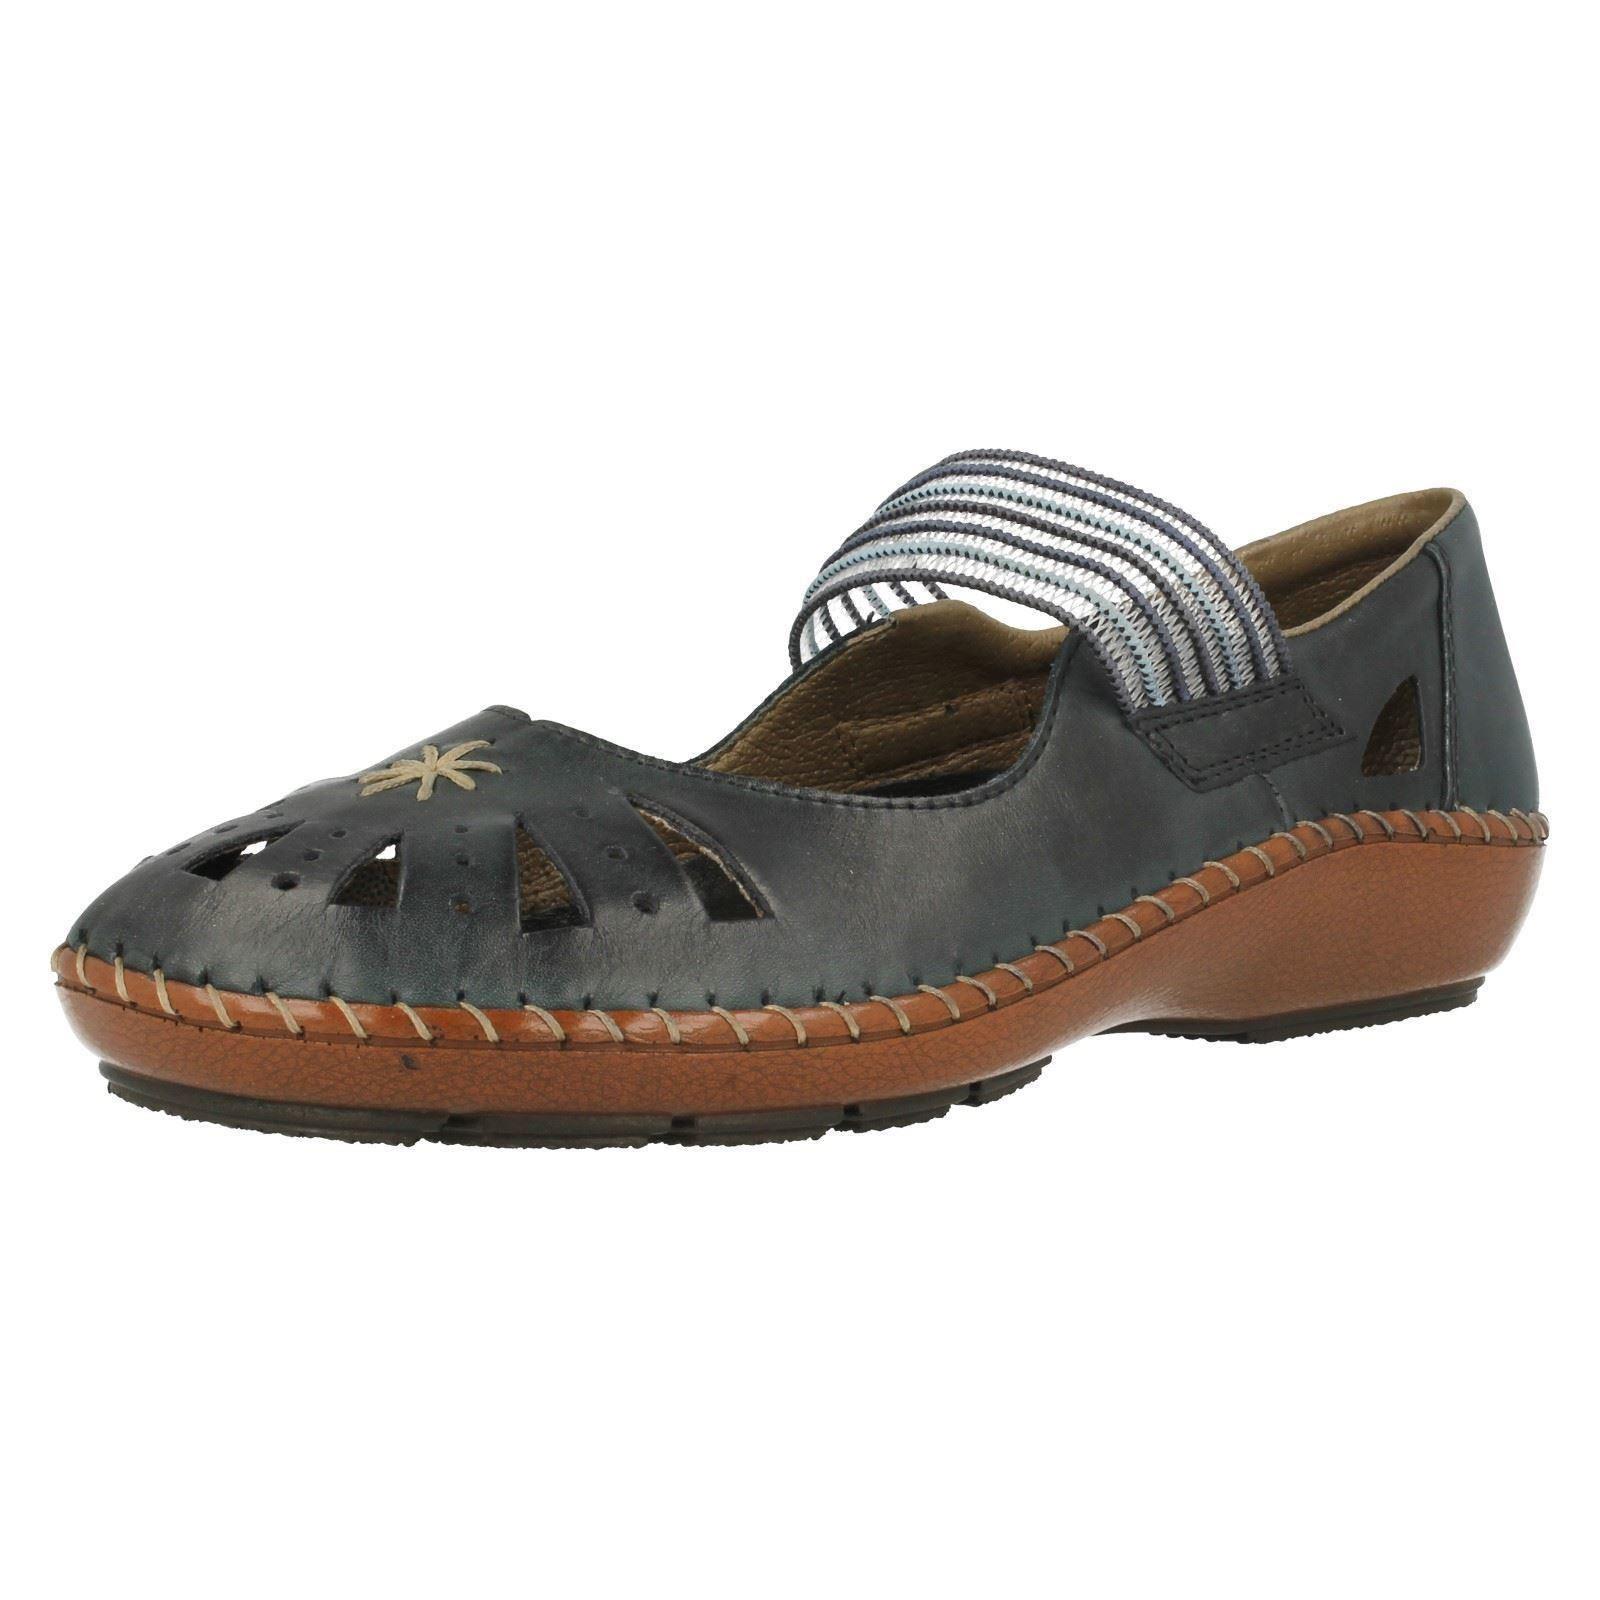 rieker casual flat shoes 44865